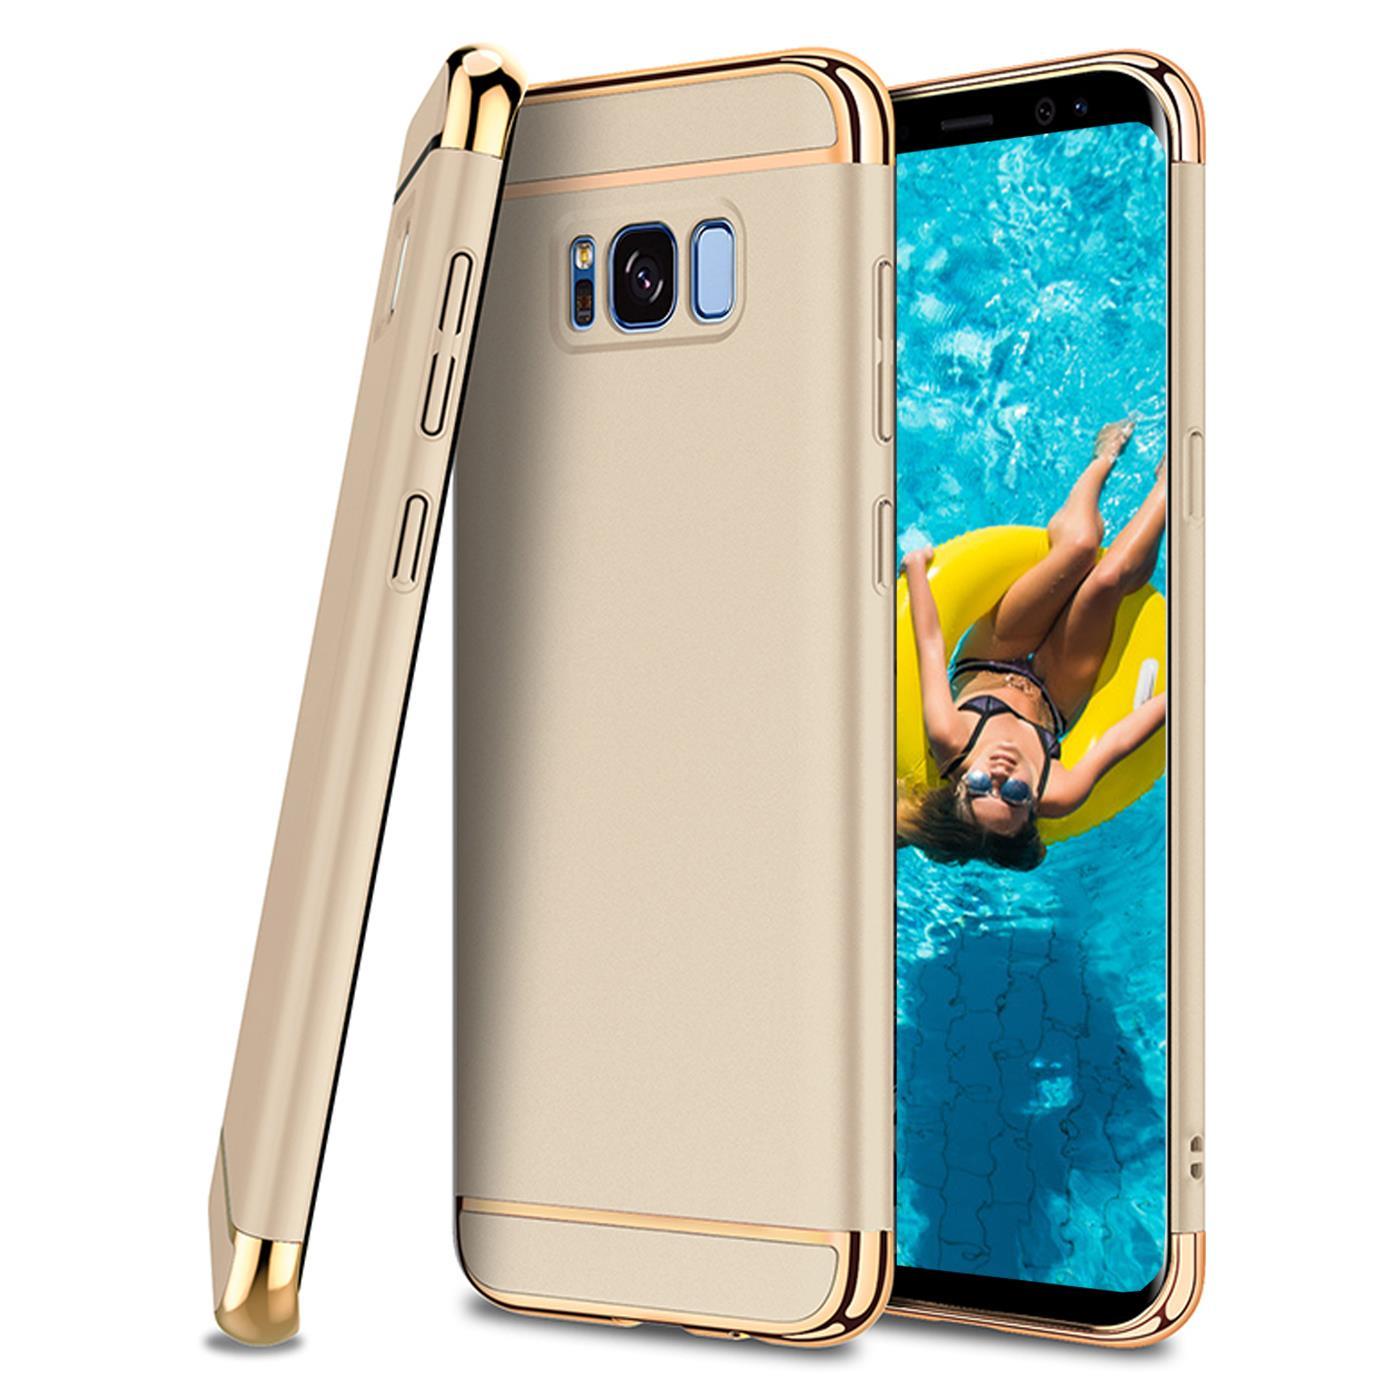 Samsung Galaxy A5 2017 Hybrid Cover Hlle Hardcase Handyhlle Tasche Gold Huelle